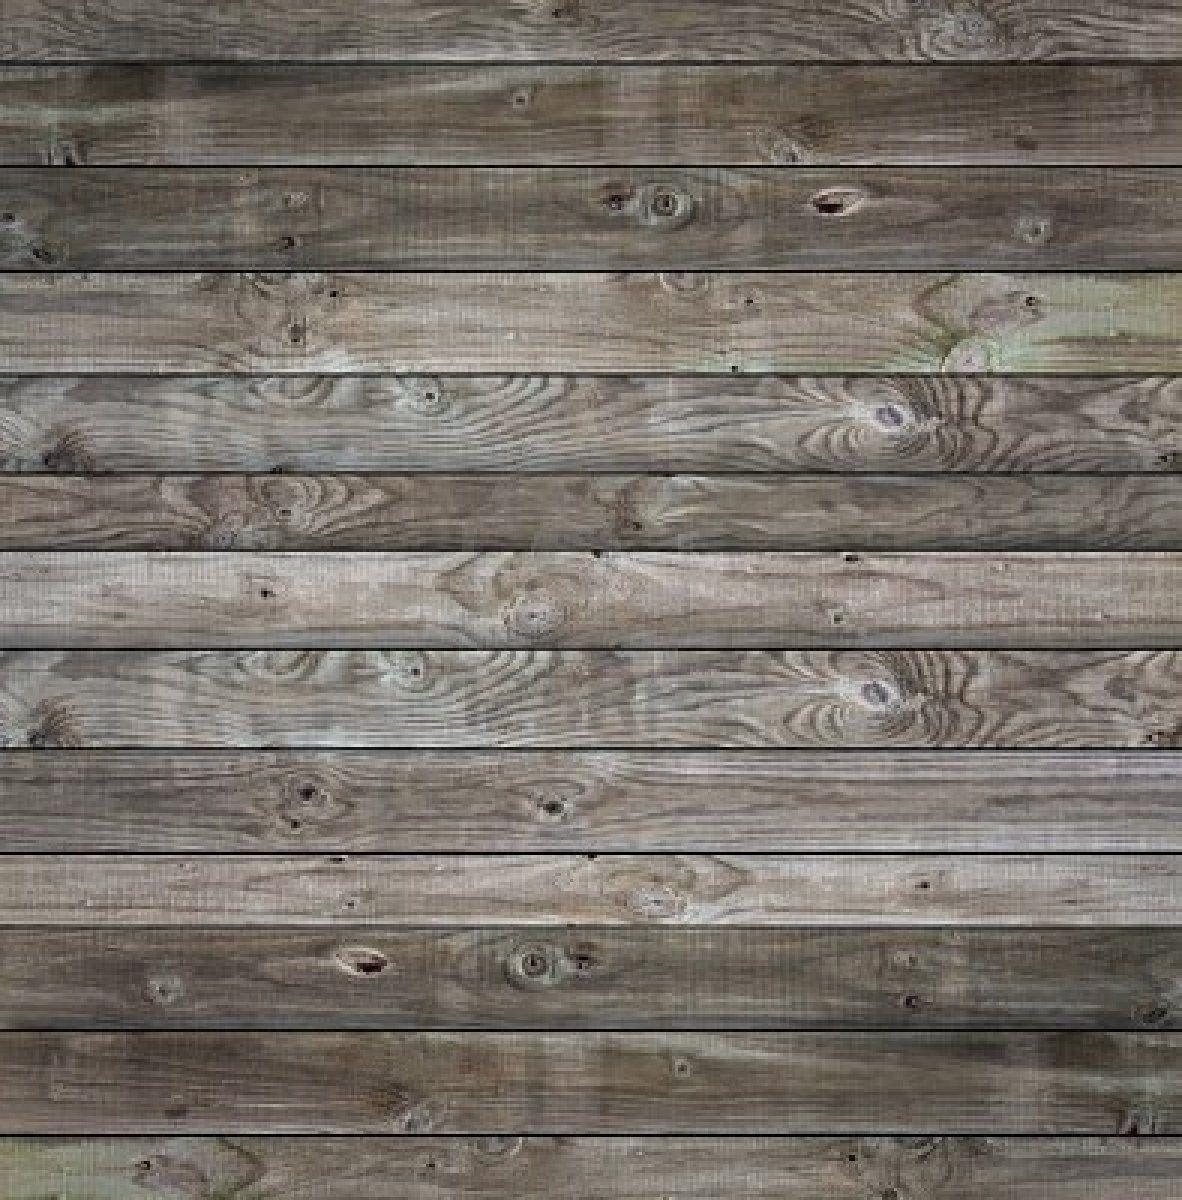 old barn wood ideas | Barn Wood Background | Background ...